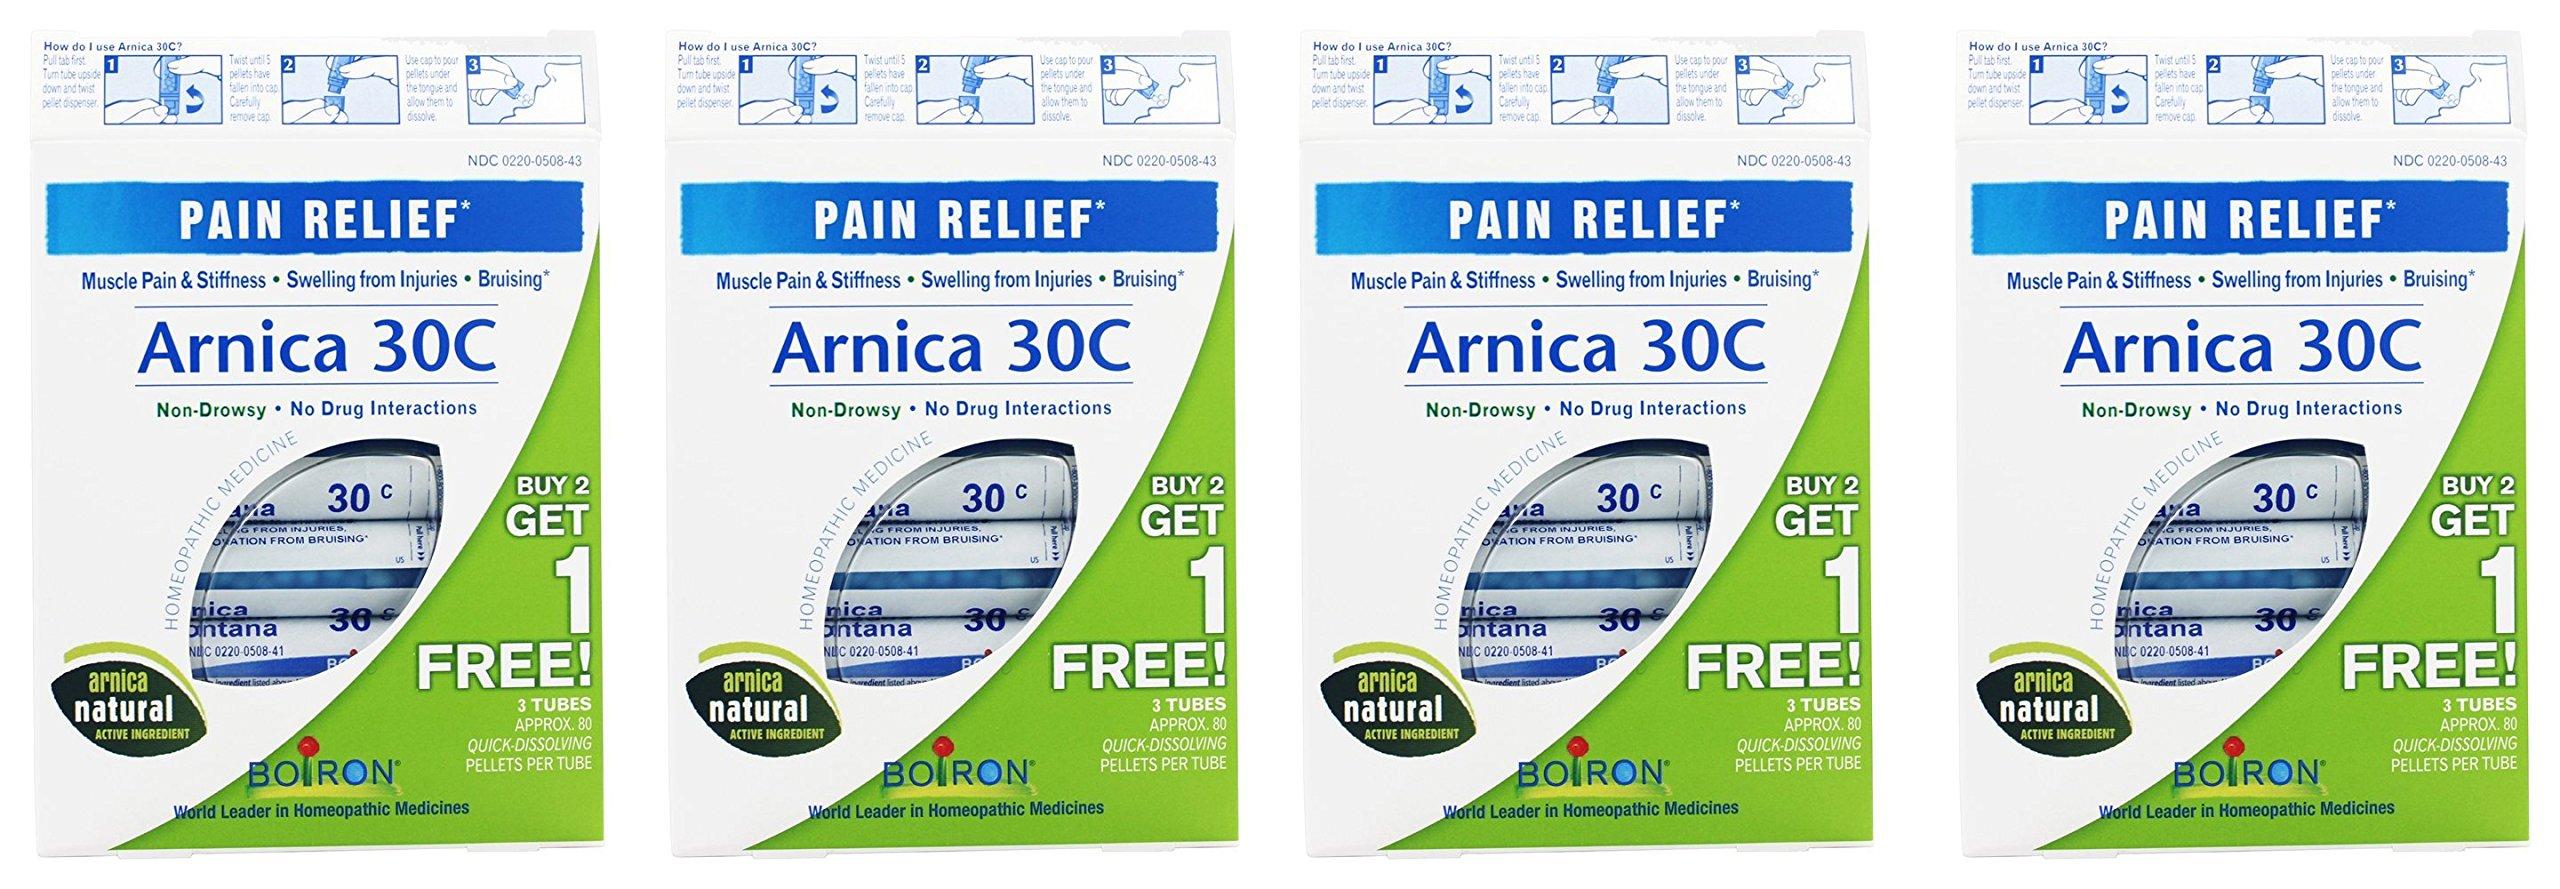 Boiron Arnica 30C Pellets (3 tubes per box) (Pack of 4)